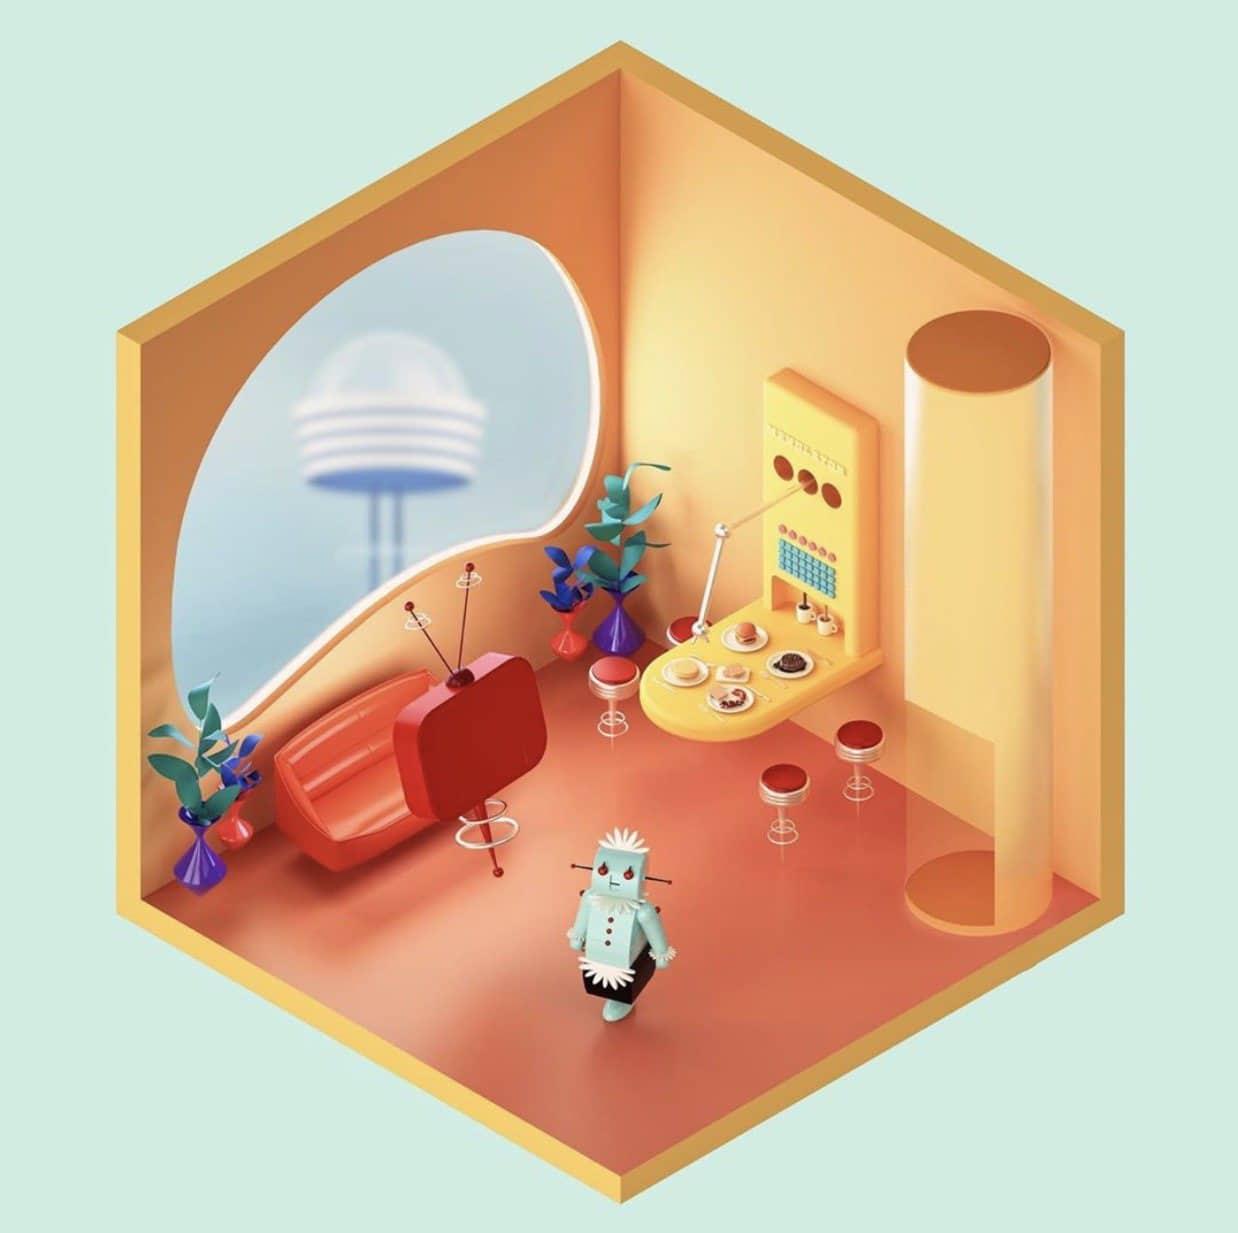 Isometric futuristic by Amrit Pal Singh